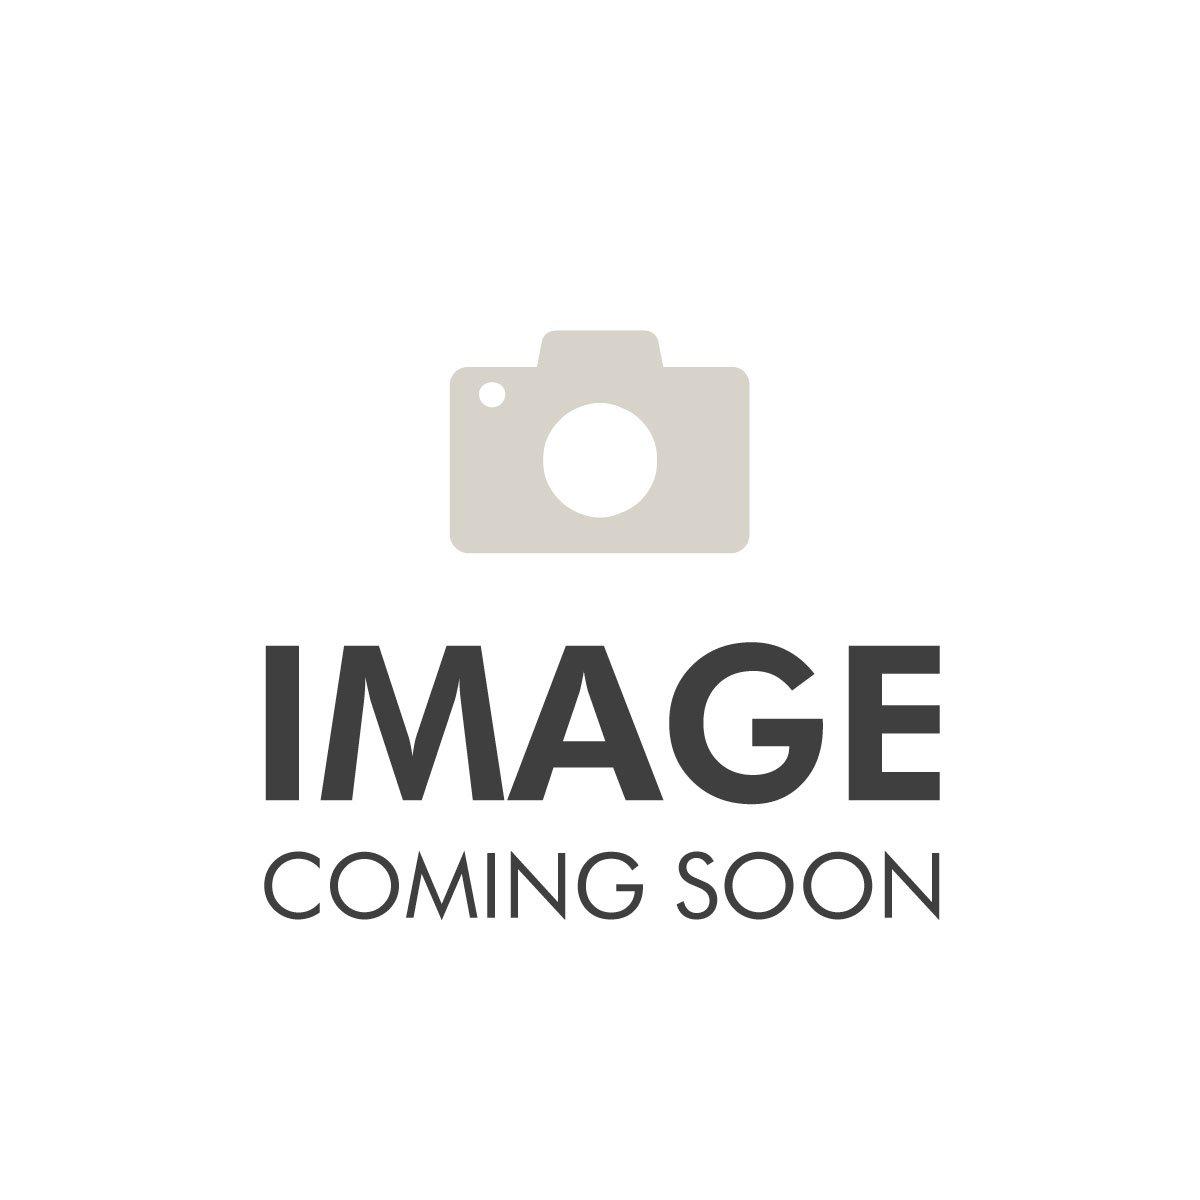 Thierry Mugler Alien Gift Set 60ml Refillable EDP Spray + 100ml Body Lotion